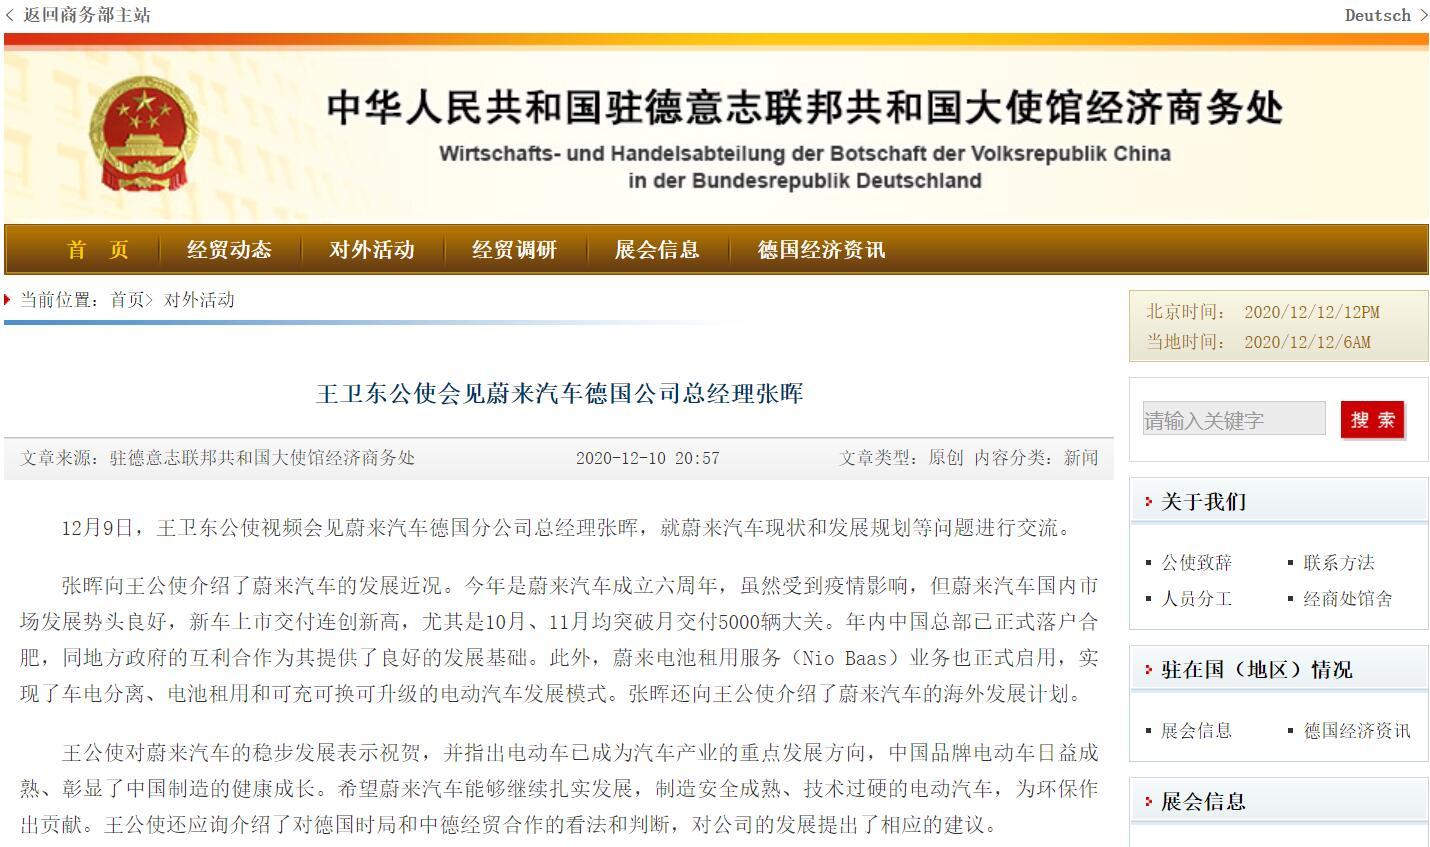 NIO is closer to entering overseas markets-CnTechPost